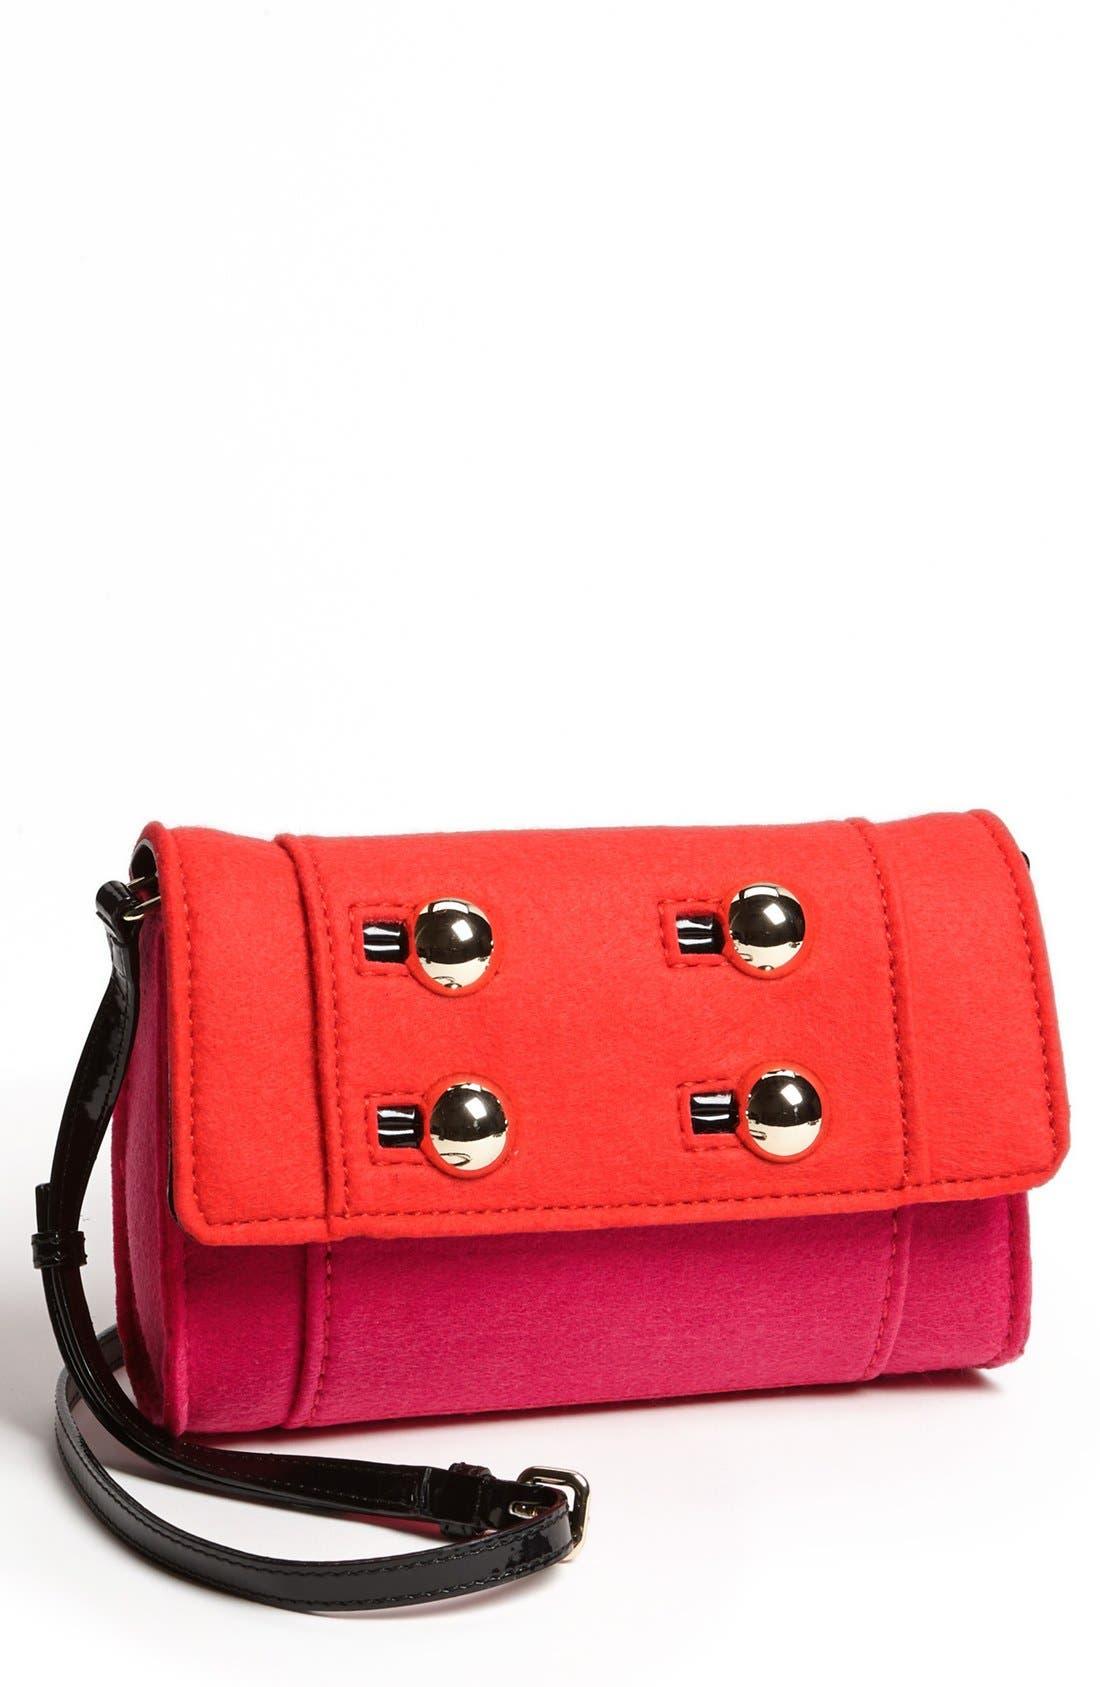 Main Image - kate spade new york 'beantown - lene' crossbody bag